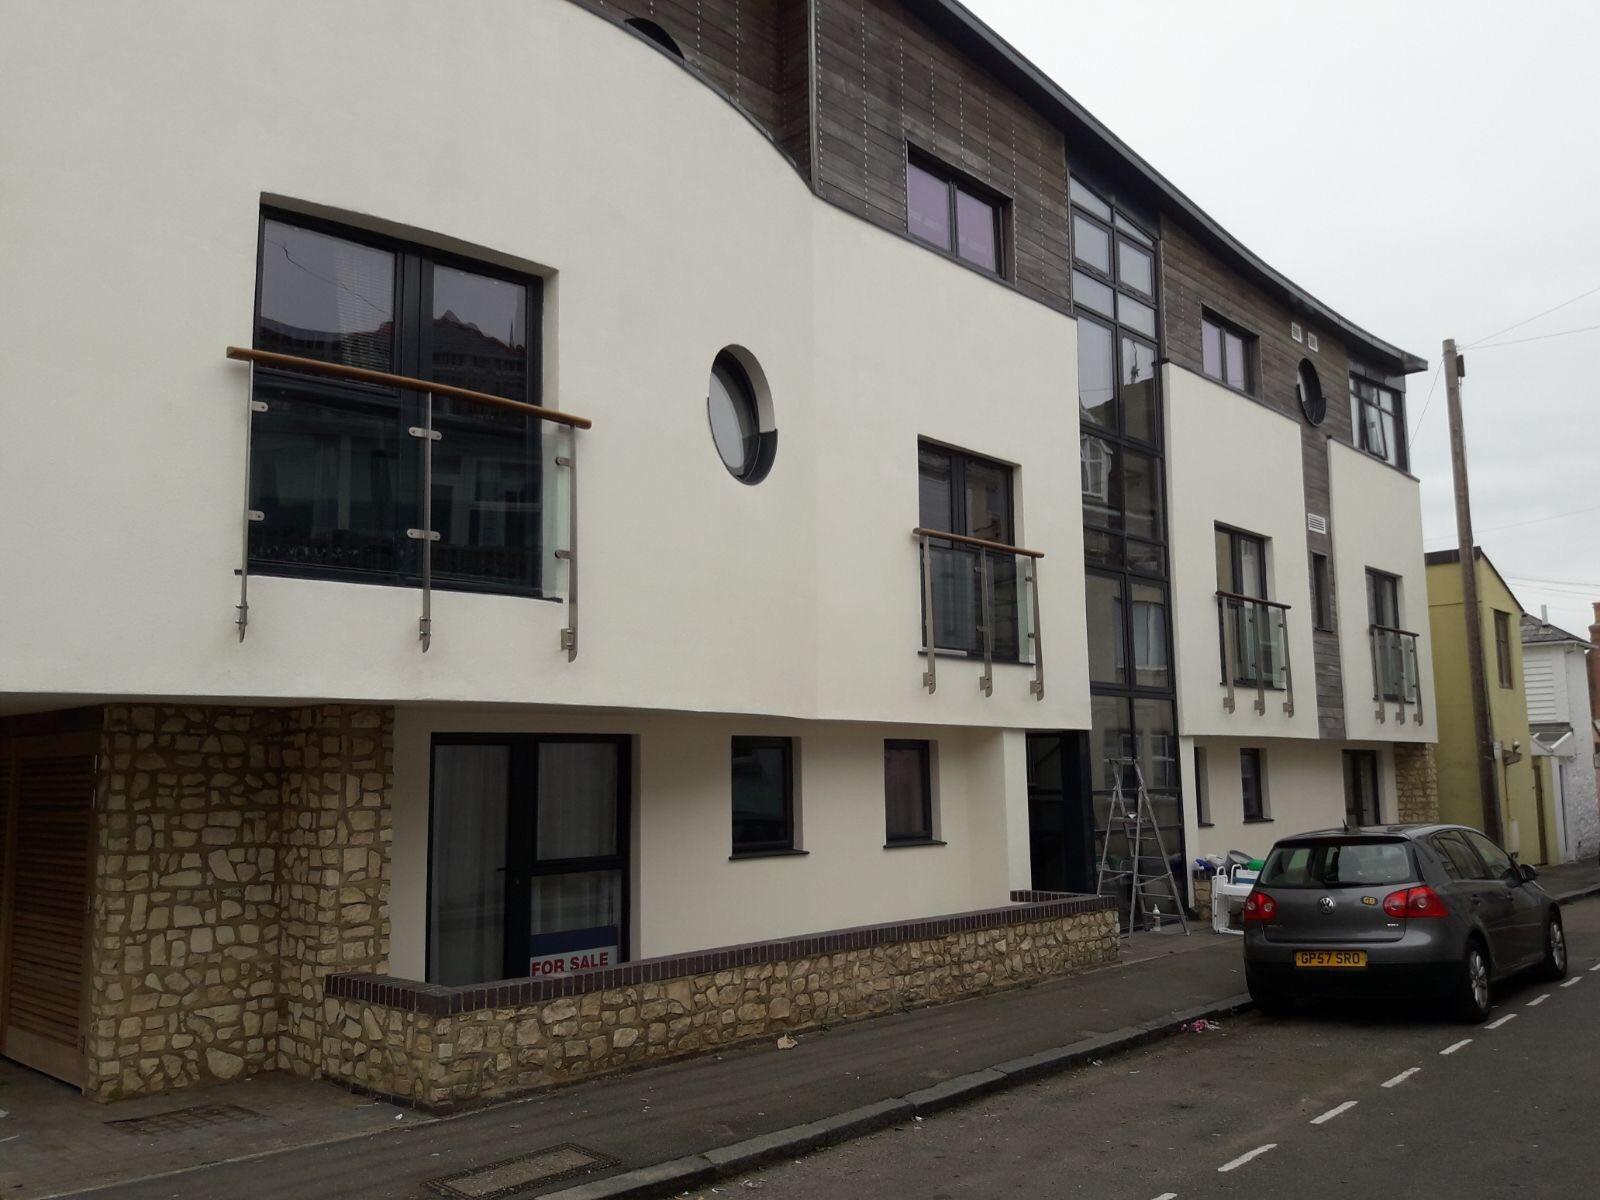 Beaufort Apartments Sandgate Hythe P A Hollingworth